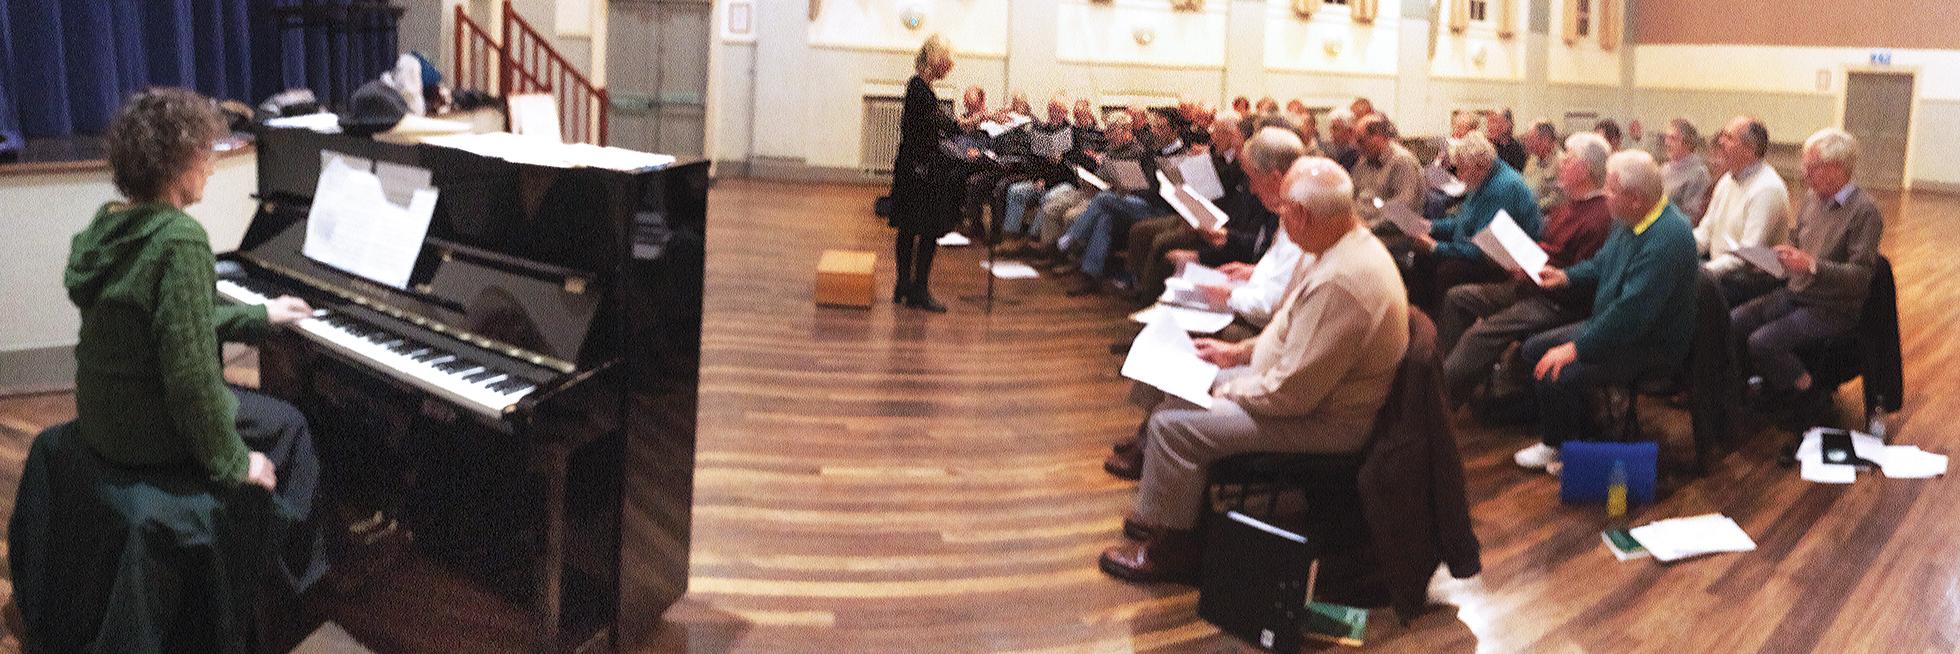 choir-practice.jpg